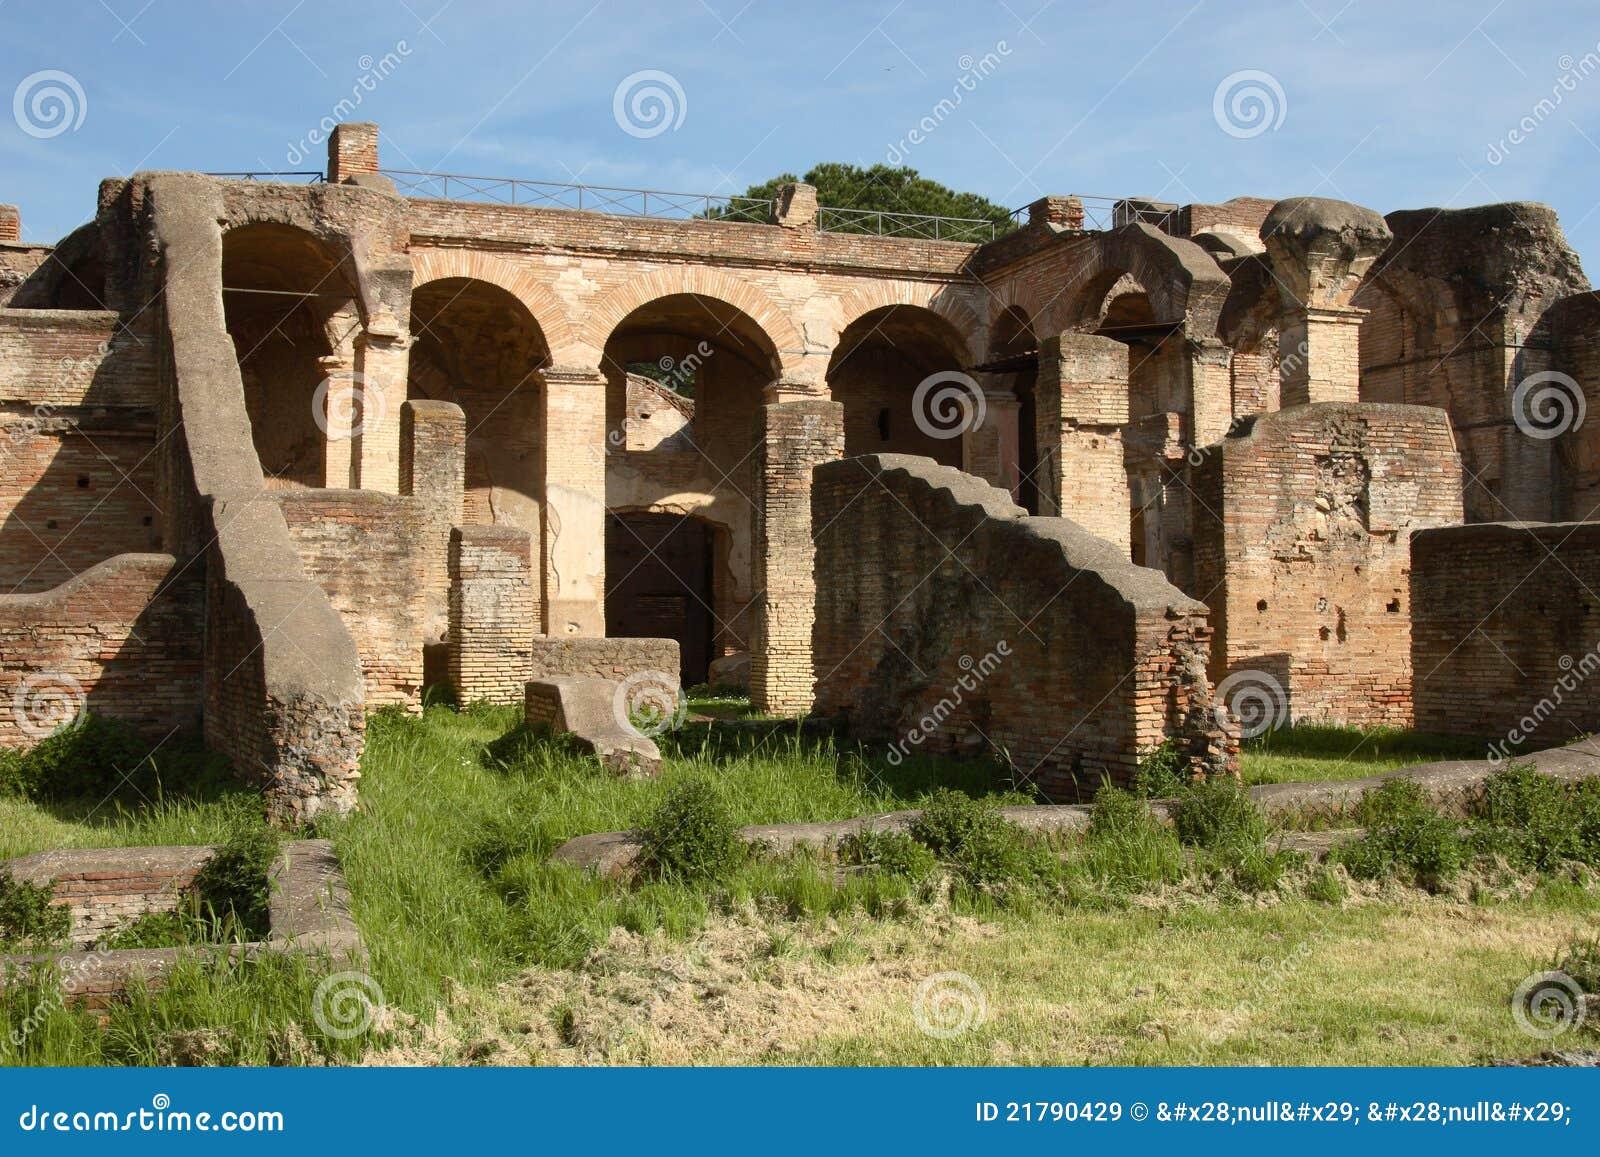 Ostia antica 39 s ruins royalty free stock images image for Mr arredamenti ostia antica